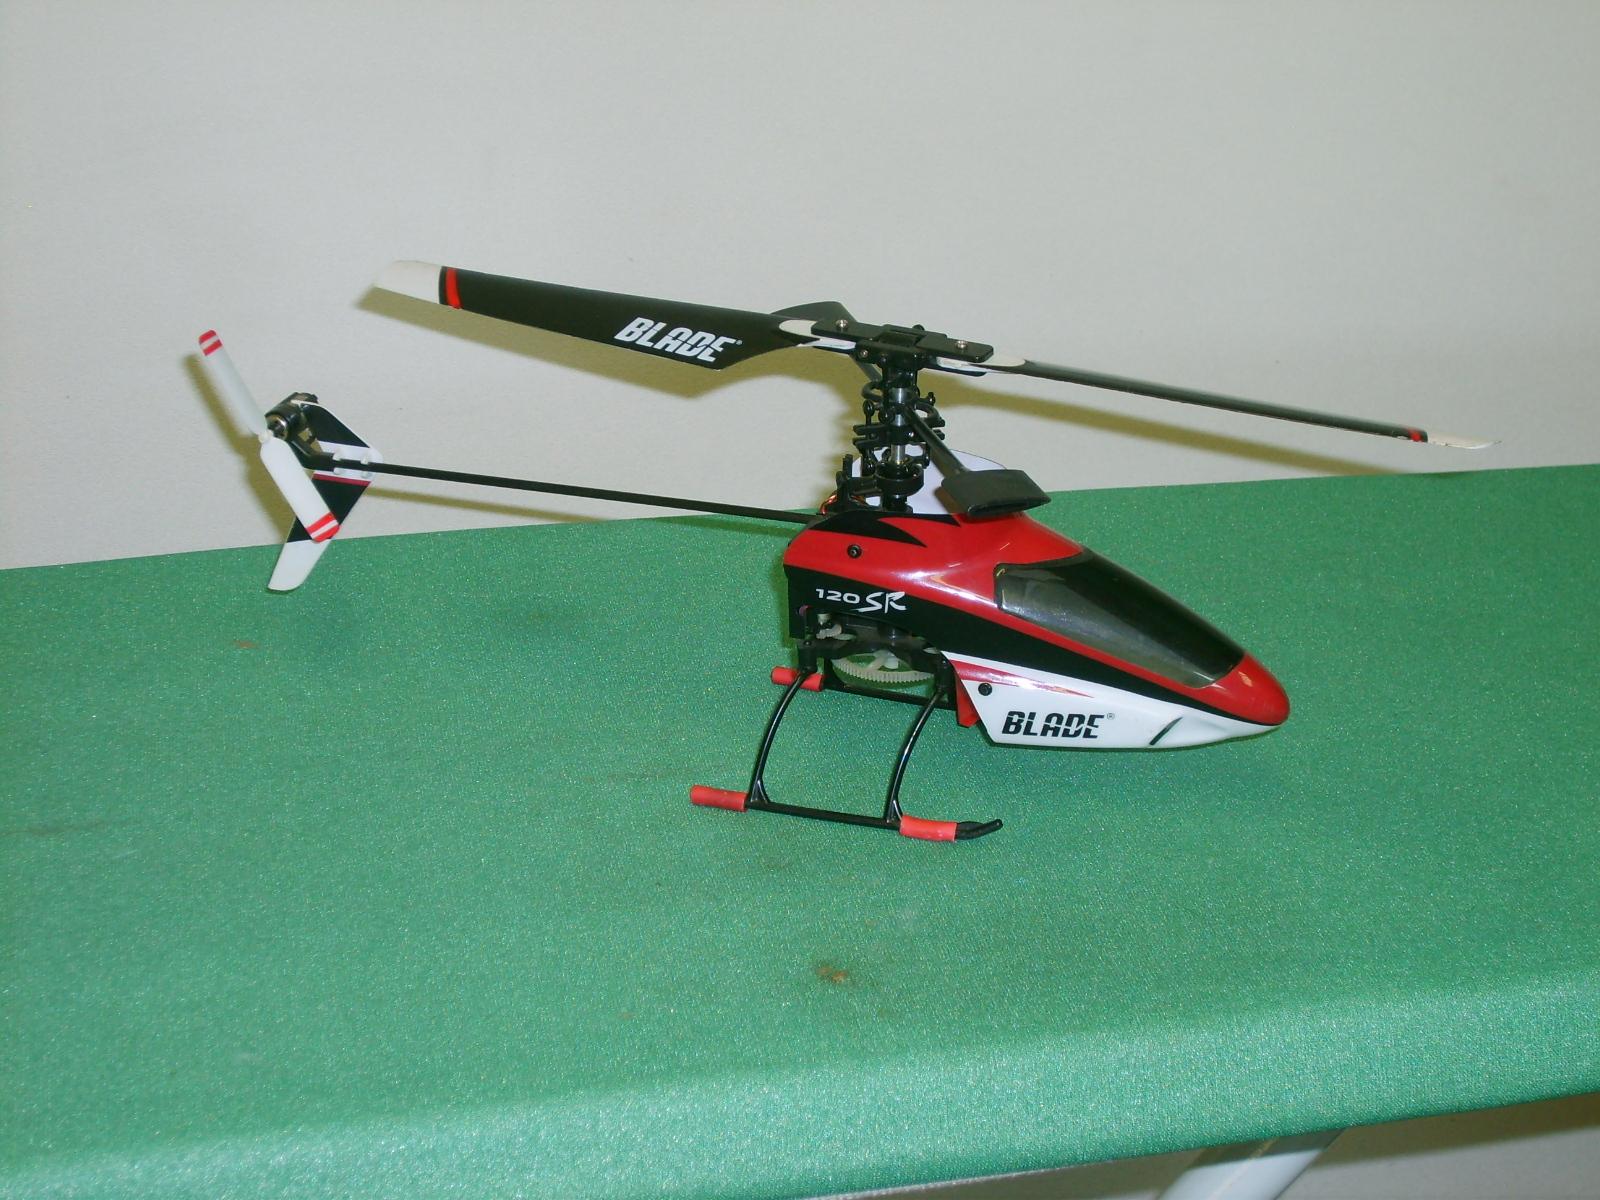 Blade 120SR